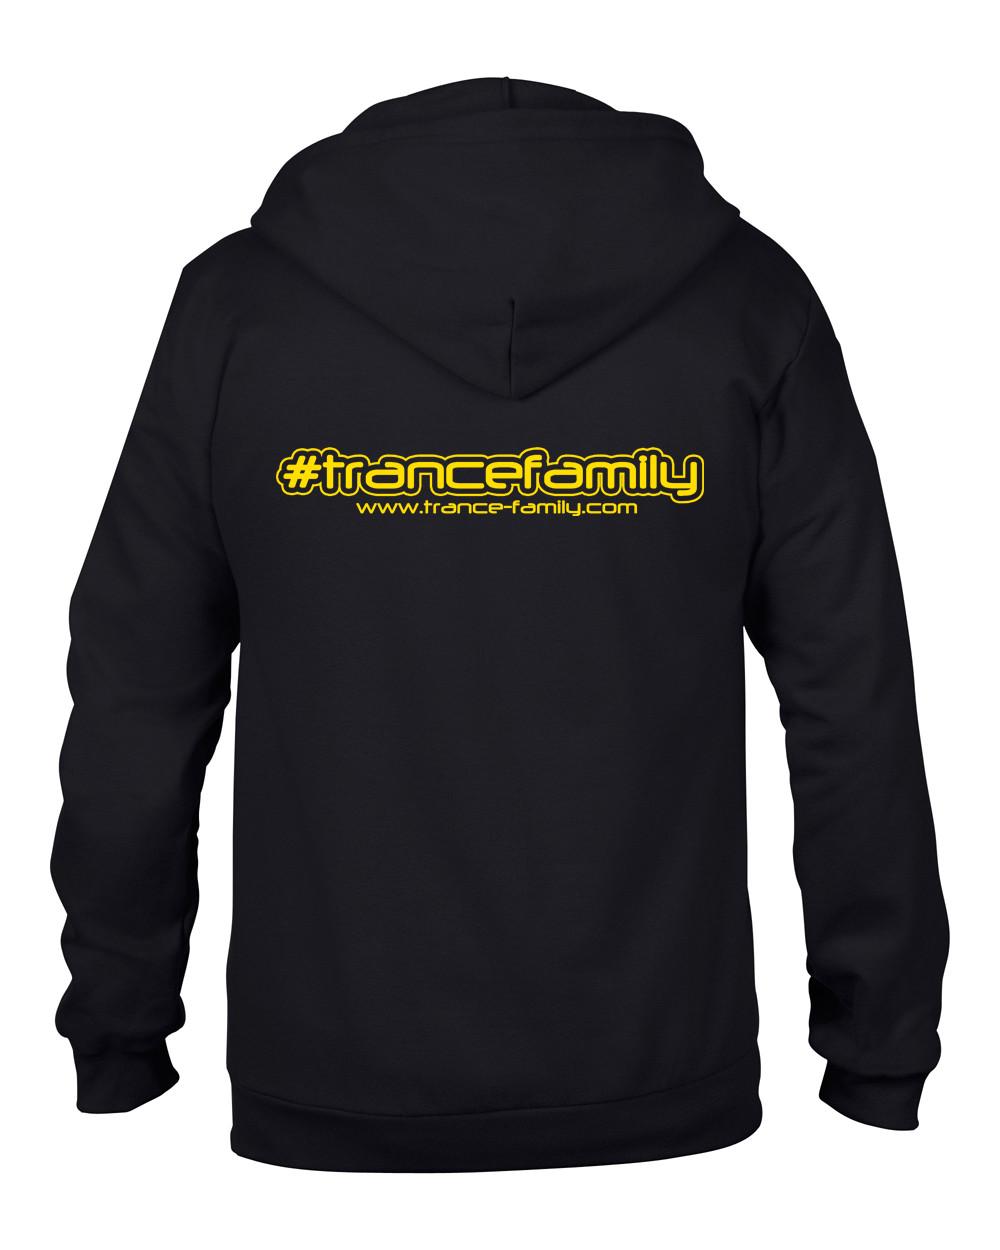 Trance-Family.com (#trancefamily Unisex Sweatjacket)